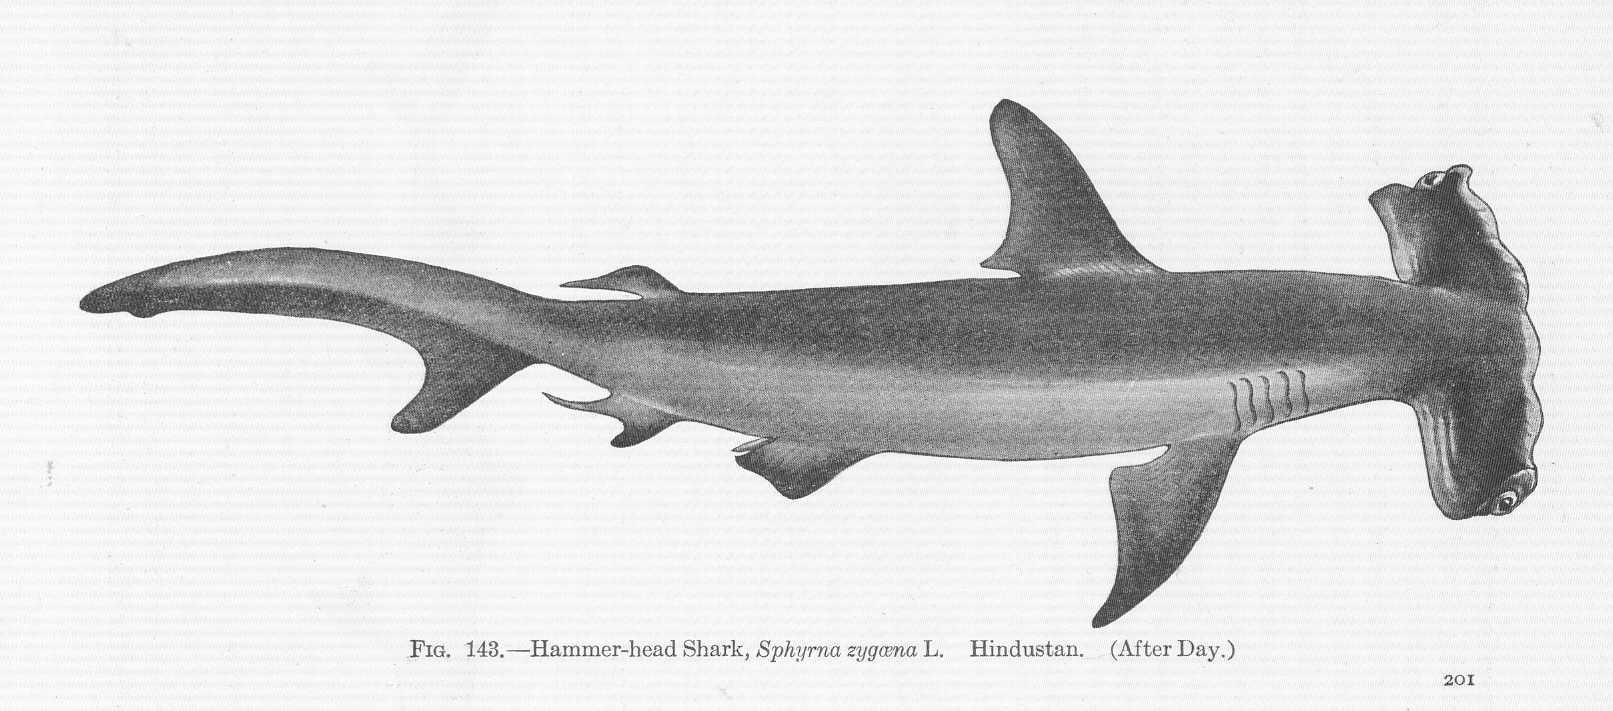 File:FMIB 51680 Hammer-head Shark, Sphyrna zygaena L ...